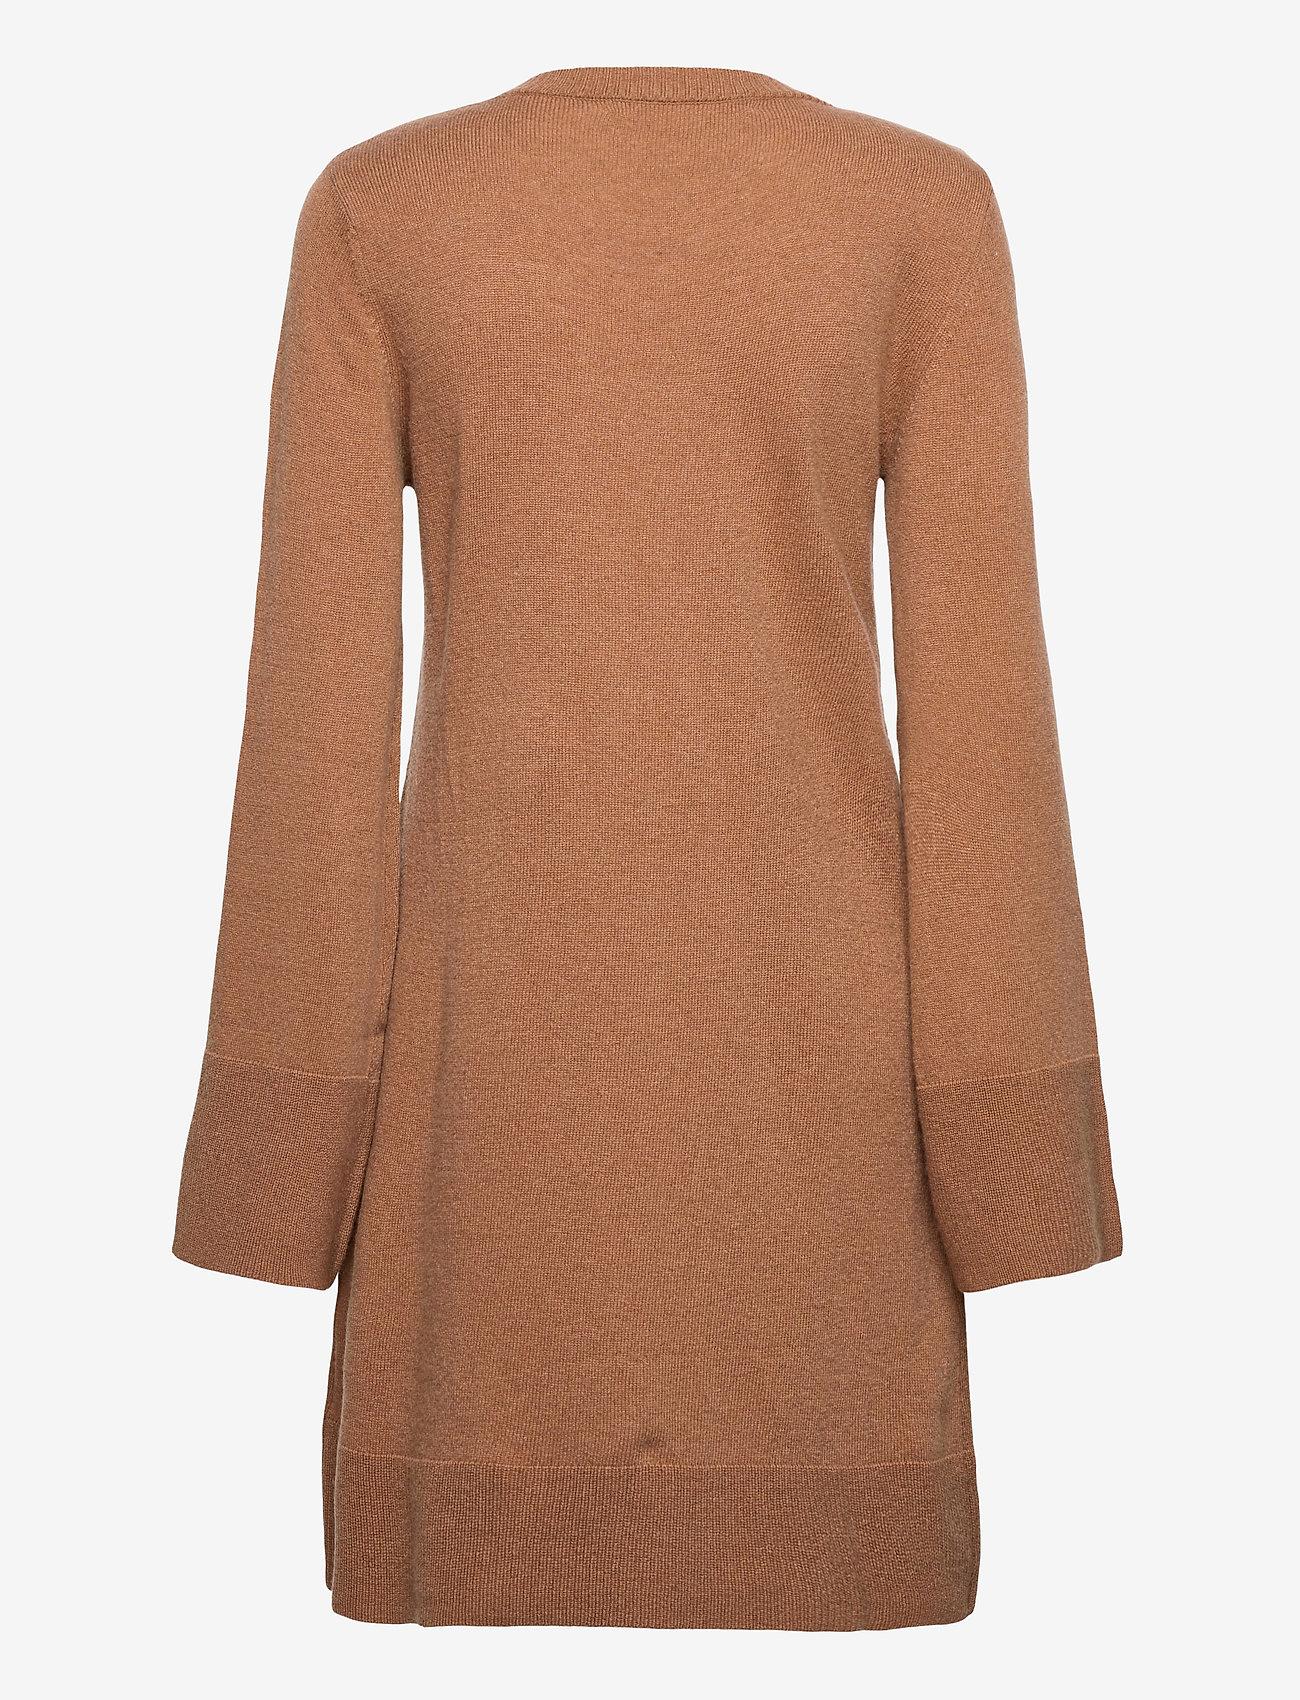 Siljaiw Dress (Winter Beige) (112.50 €) - InWear cb15W